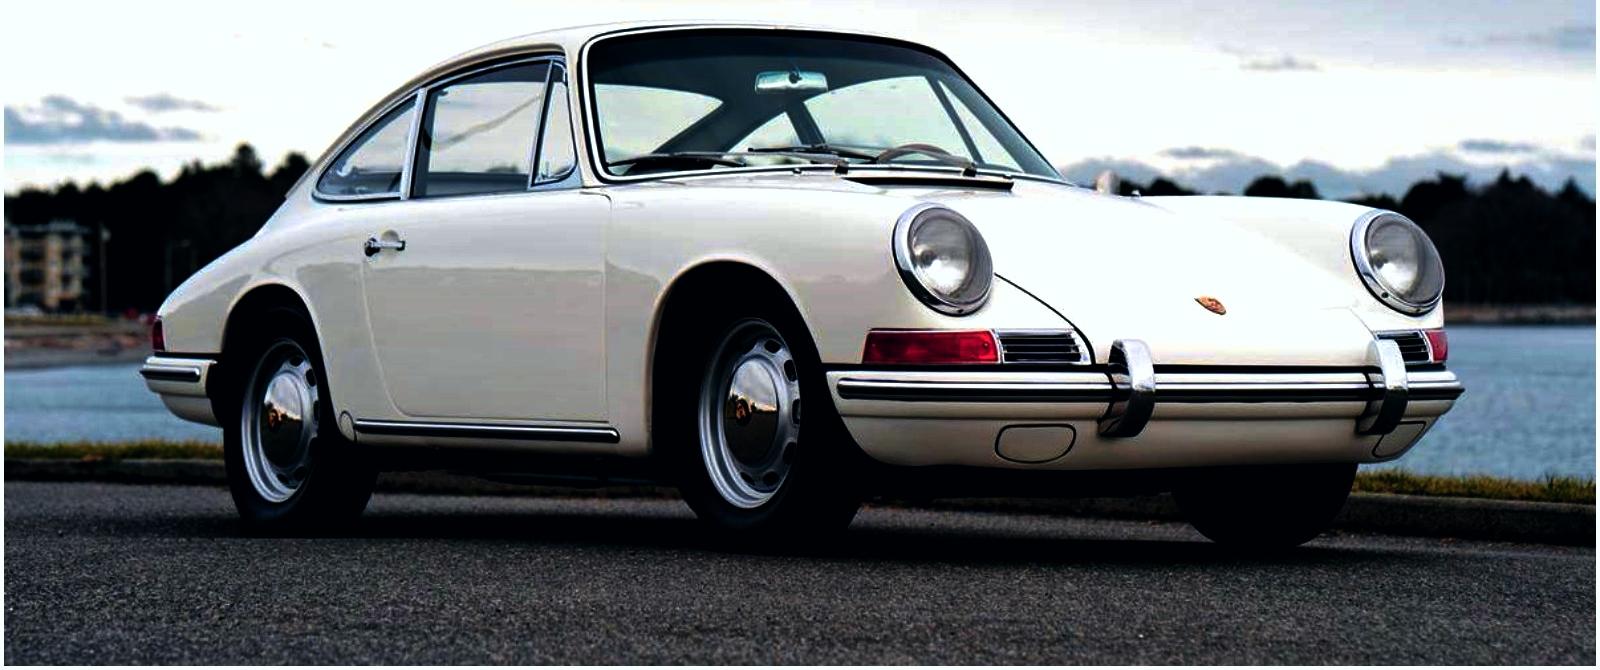 Porsche 911 SWB 2.0 1967 (RESTAURO)